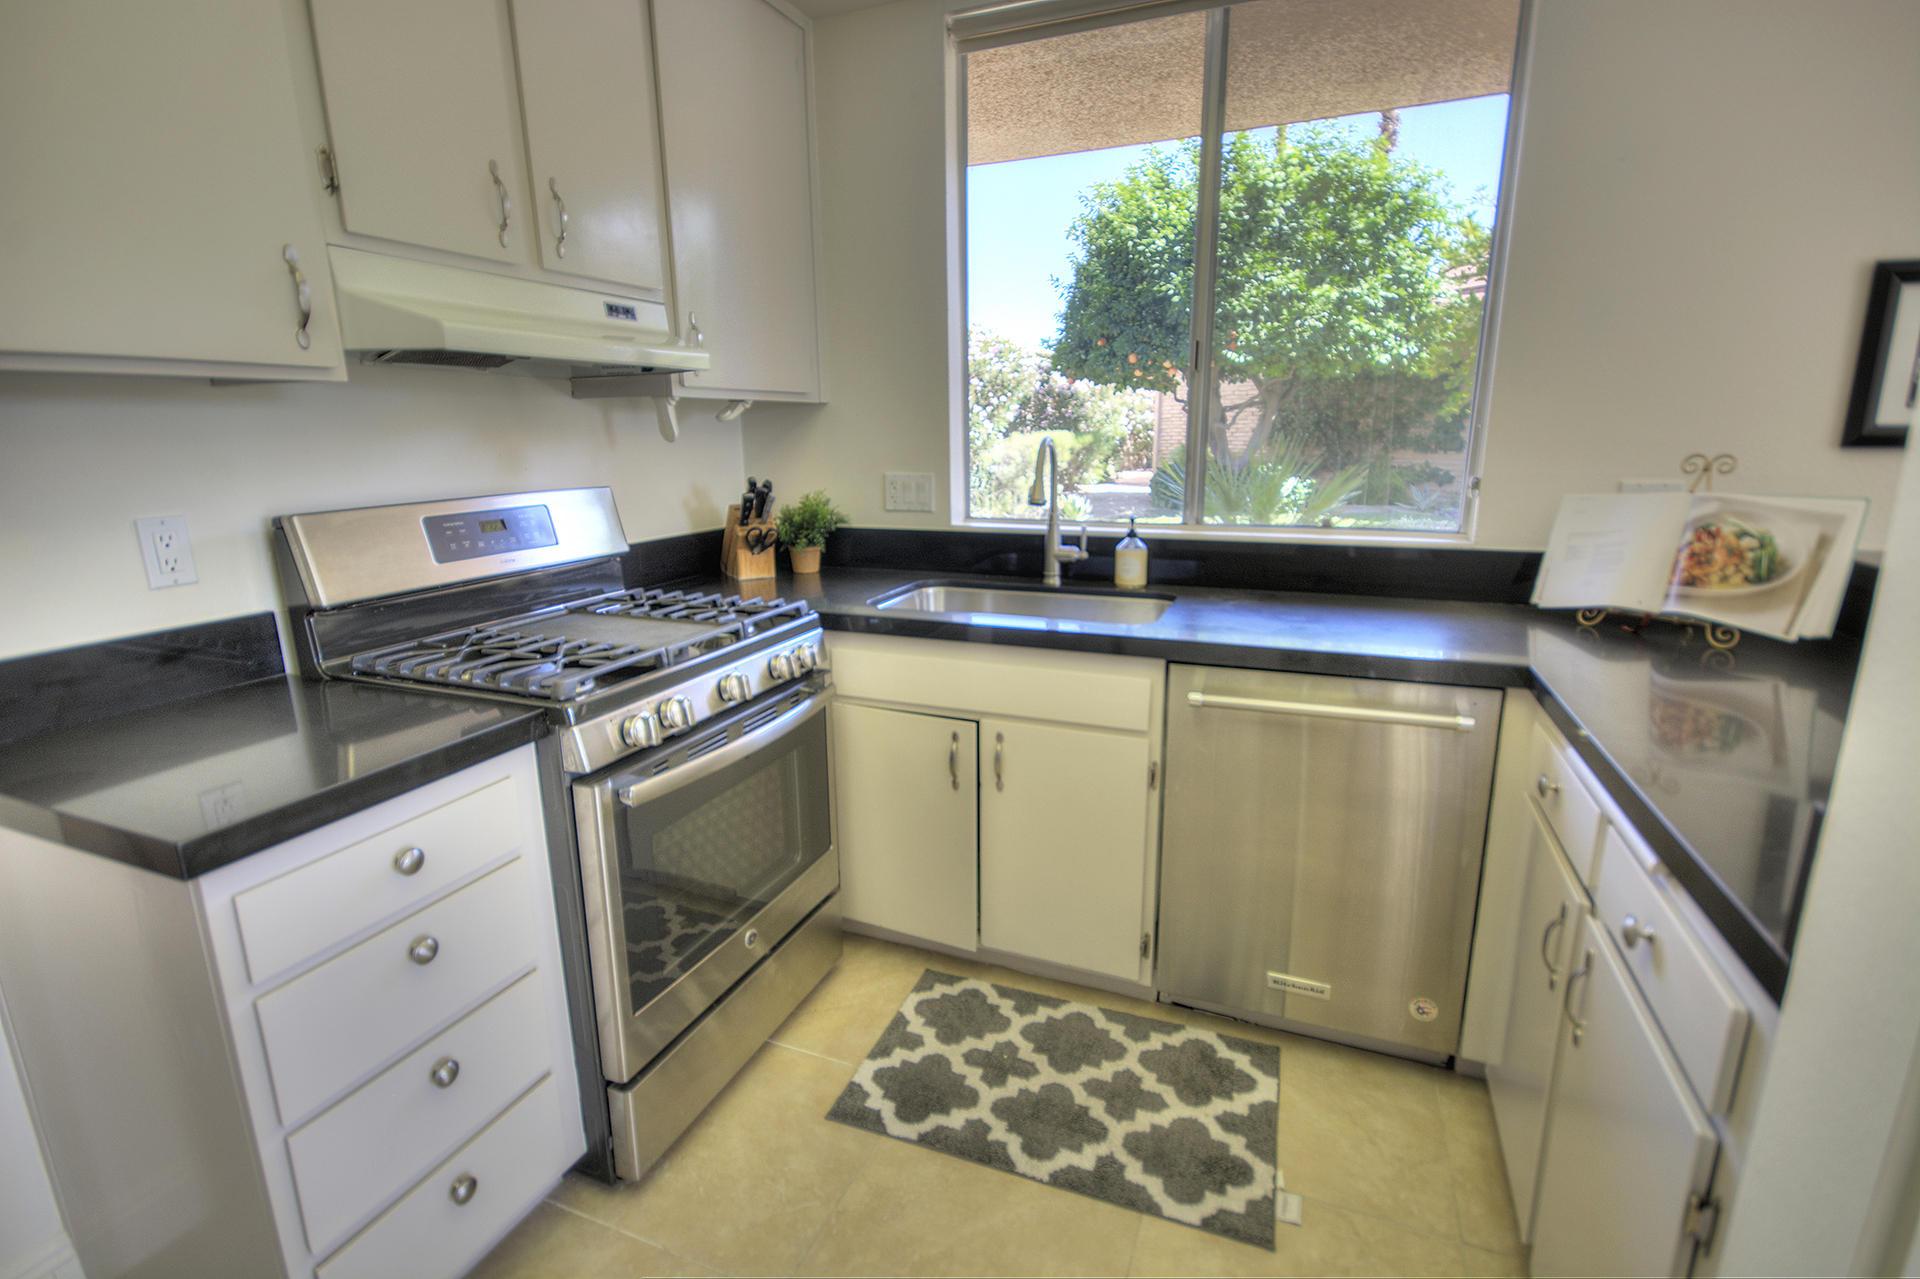 45730 Hopi Road, Indian Wells, California 92210, 3 Bedrooms Bedrooms, ,3 BathroomsBathrooms,Residential,For Sale,45730 Hopi Road,219044825